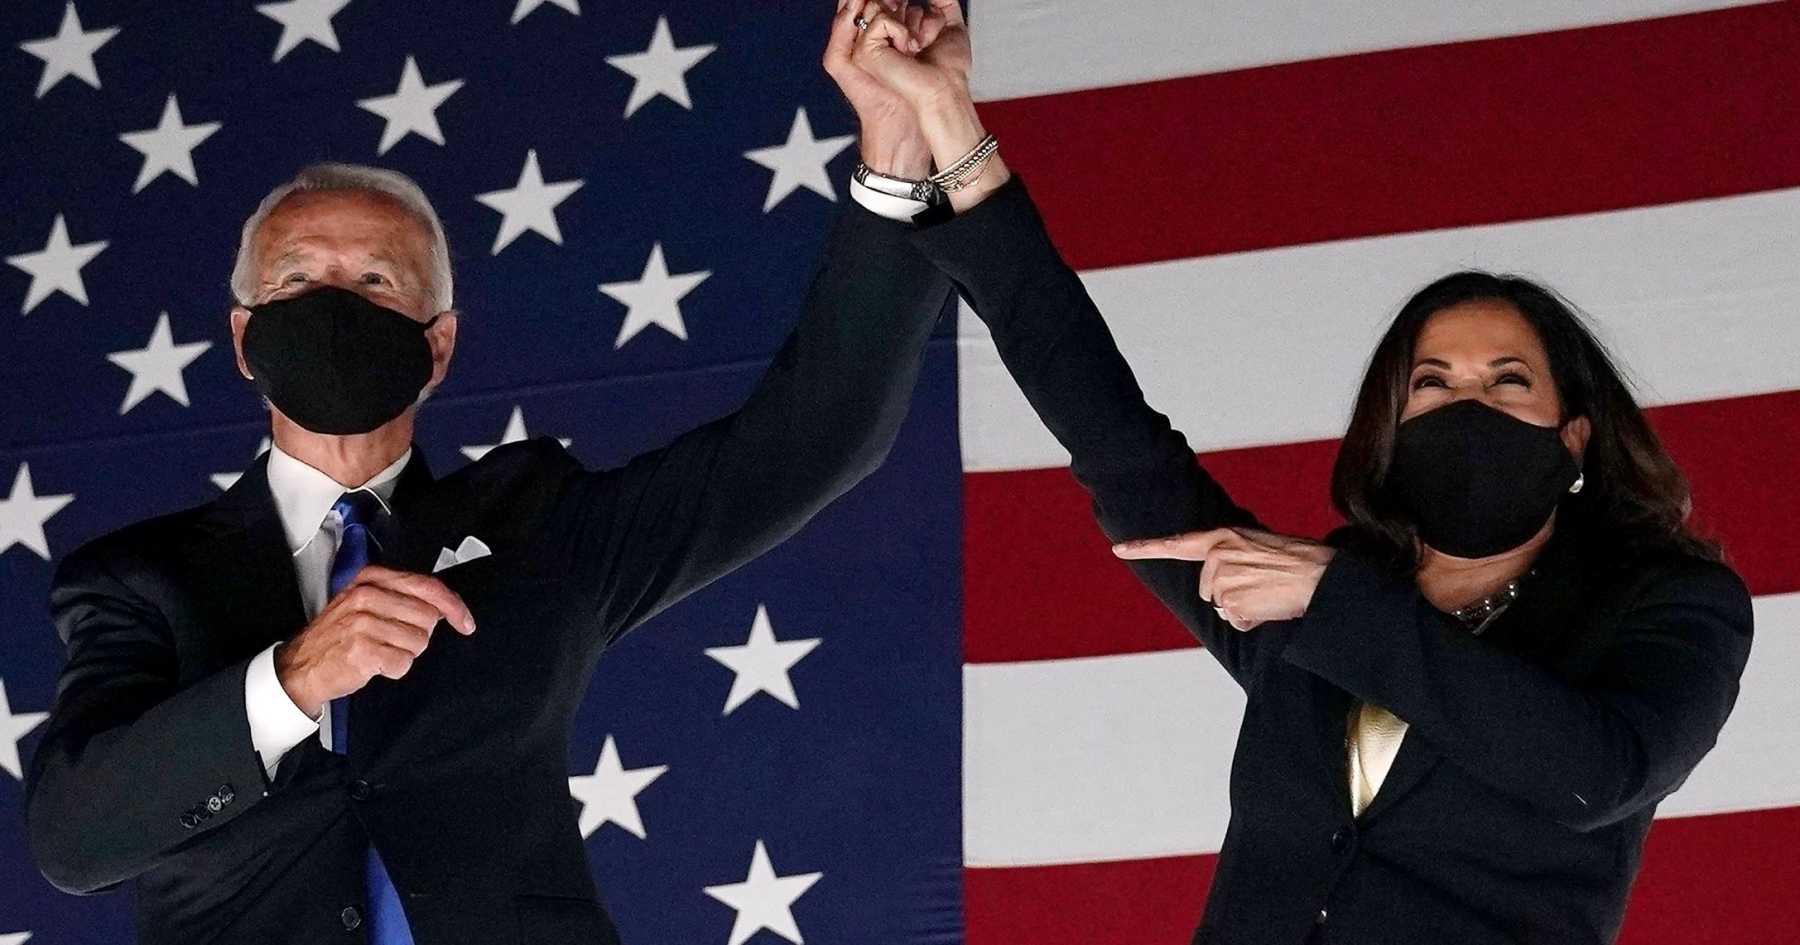 Joe Biden Named President-Elect, Kamala Harris named Vice President-Elect |  CafeMom.com